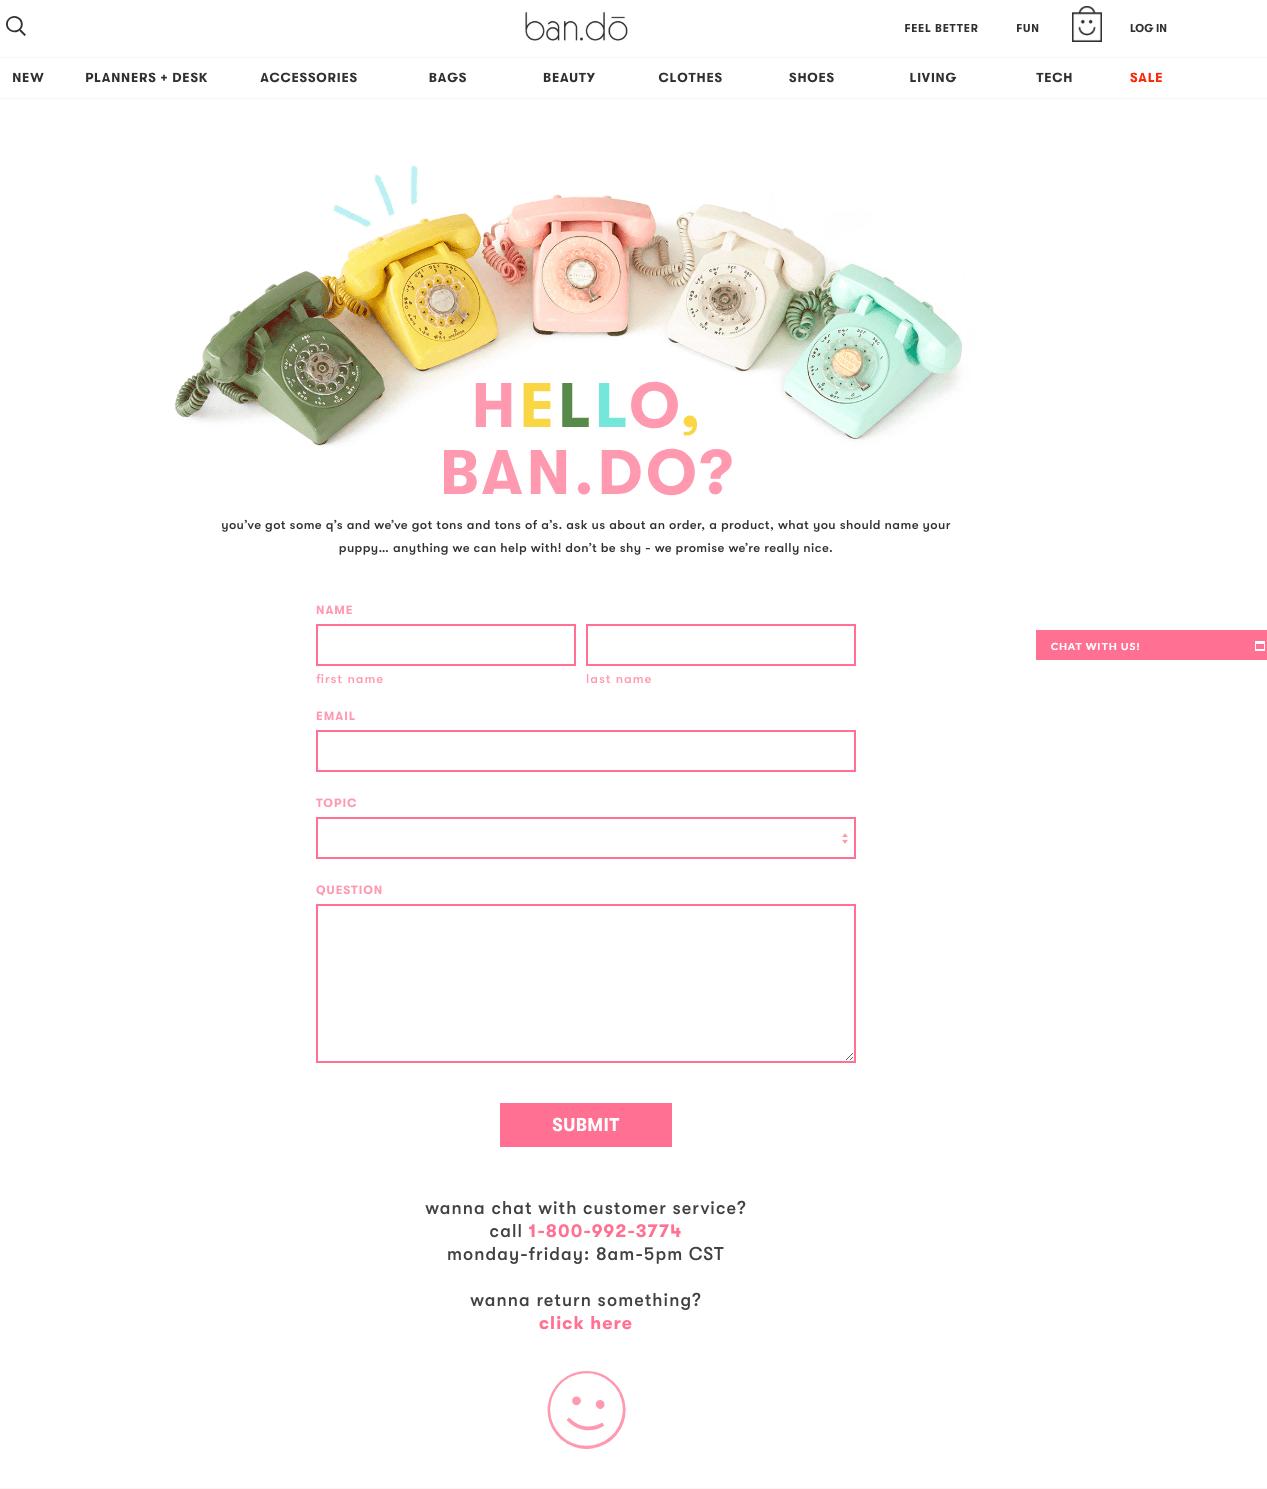 bando contact us-page